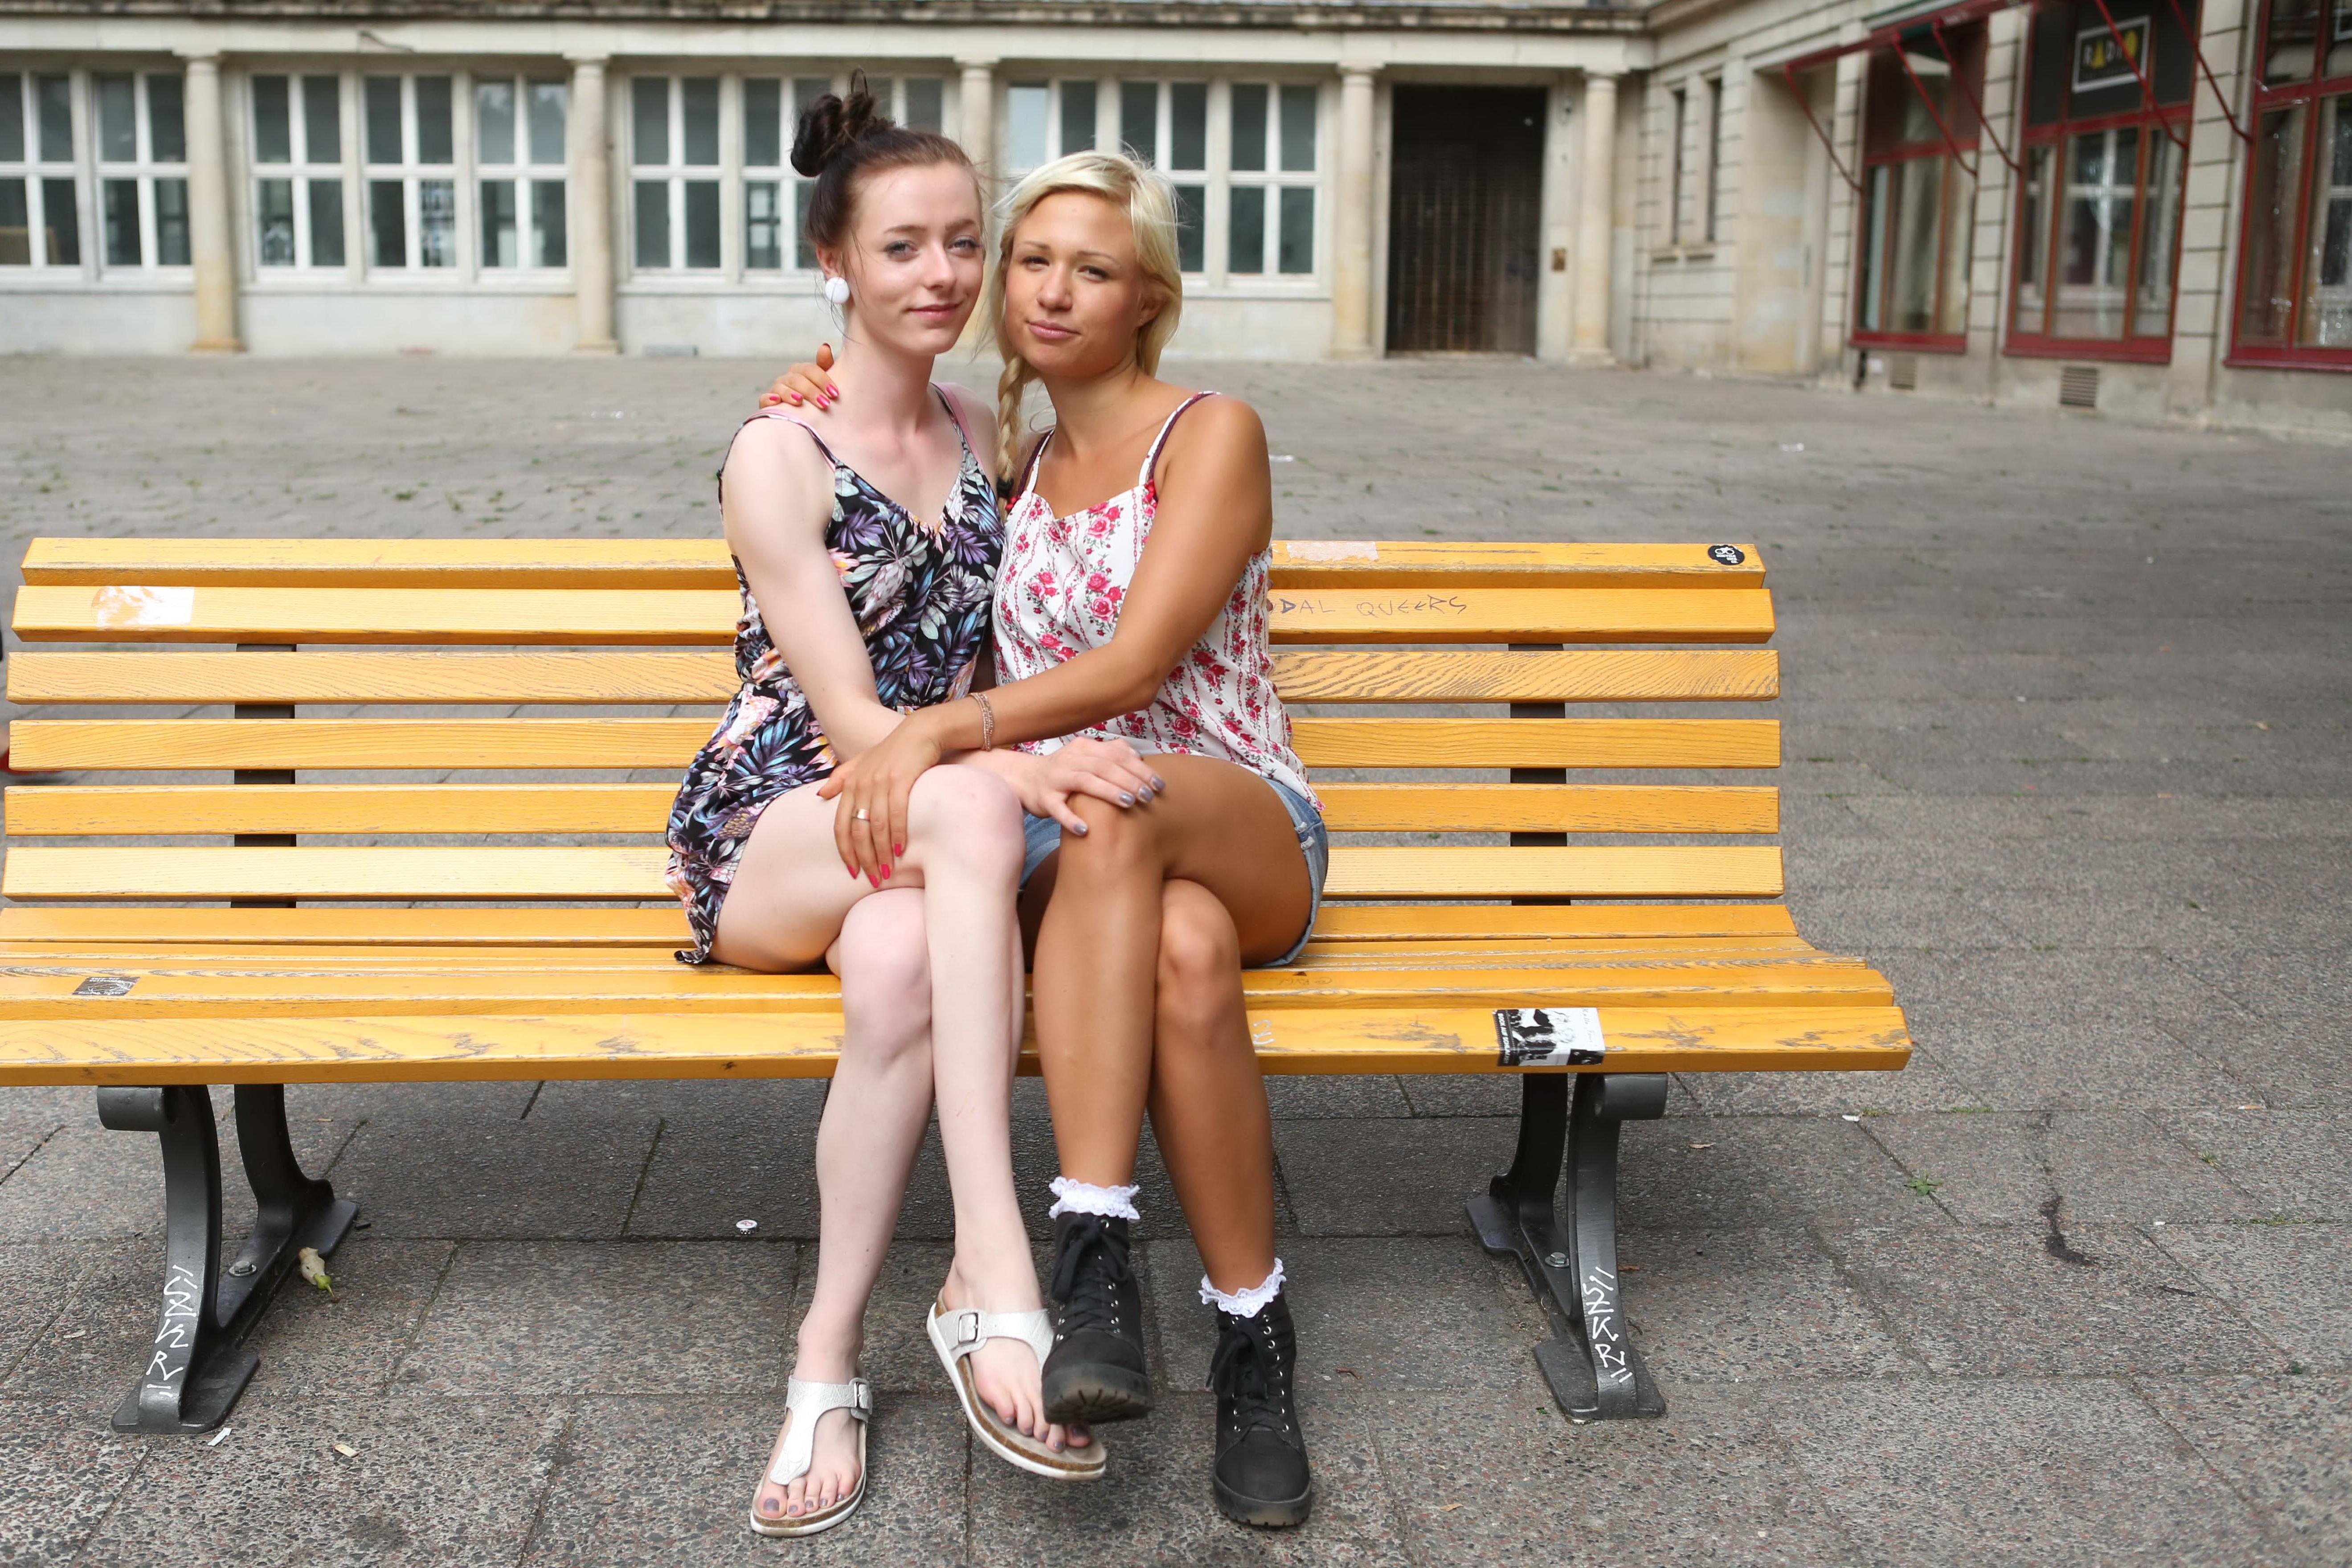 Ersties.com - Lisa M. & Gabi - Sex in Deep Harmony 13